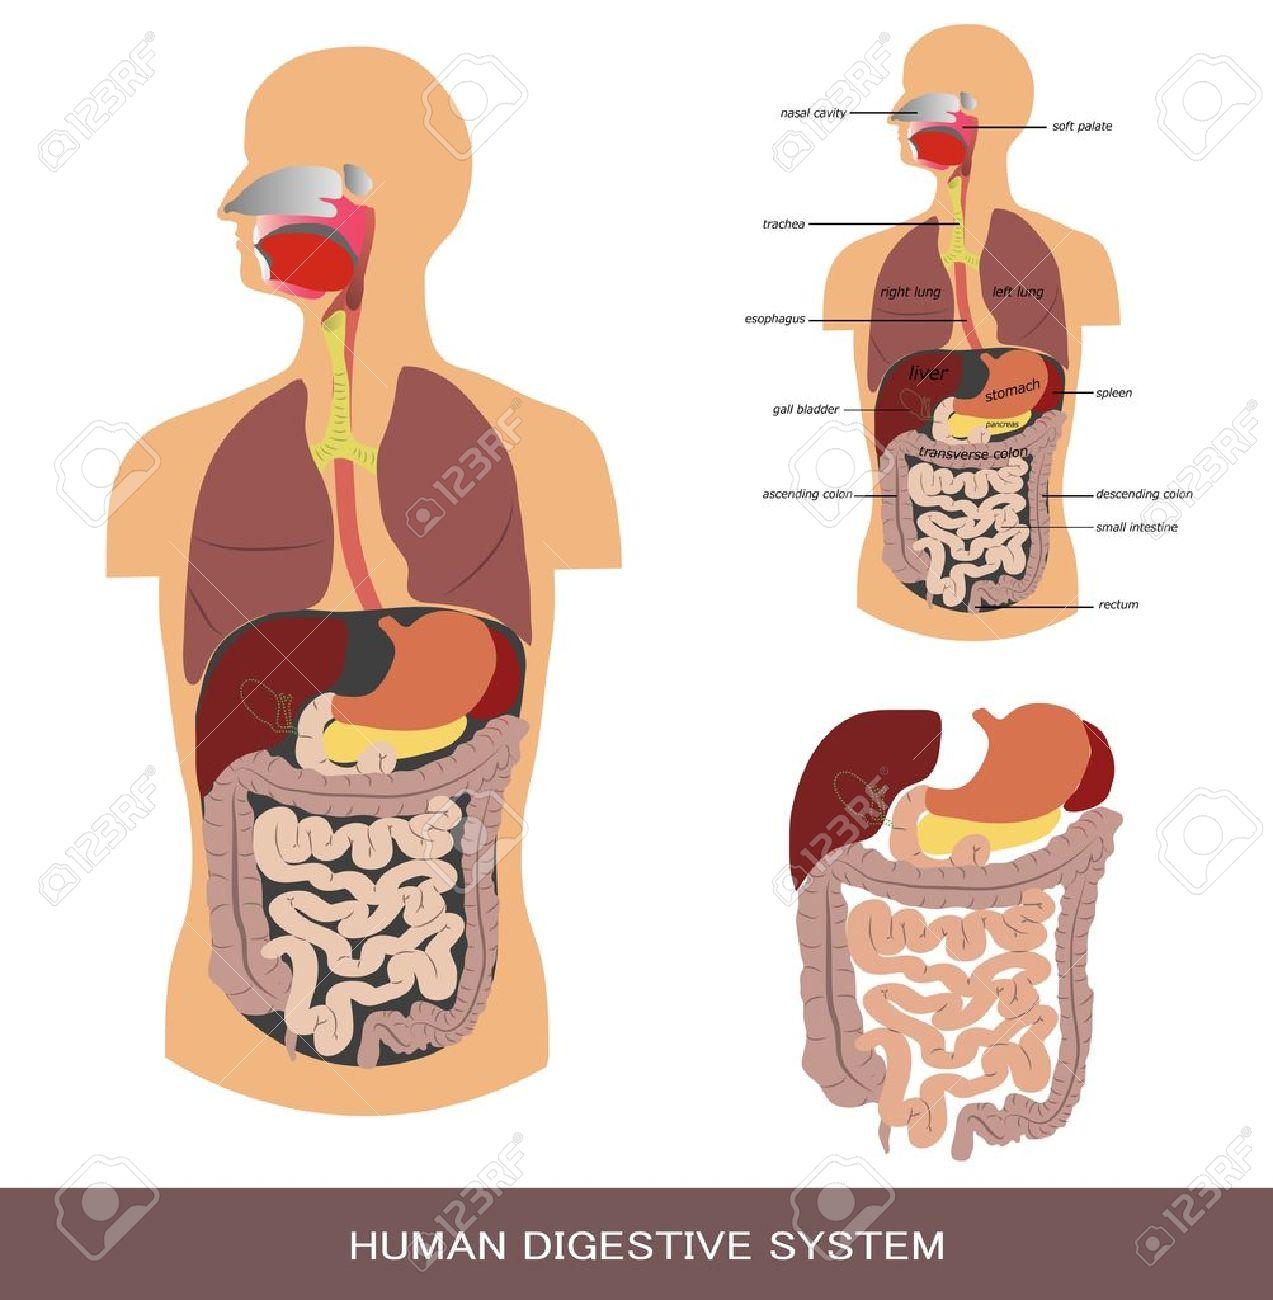 Digestive system, detailed medical illustration. Stock Vector - 11066826